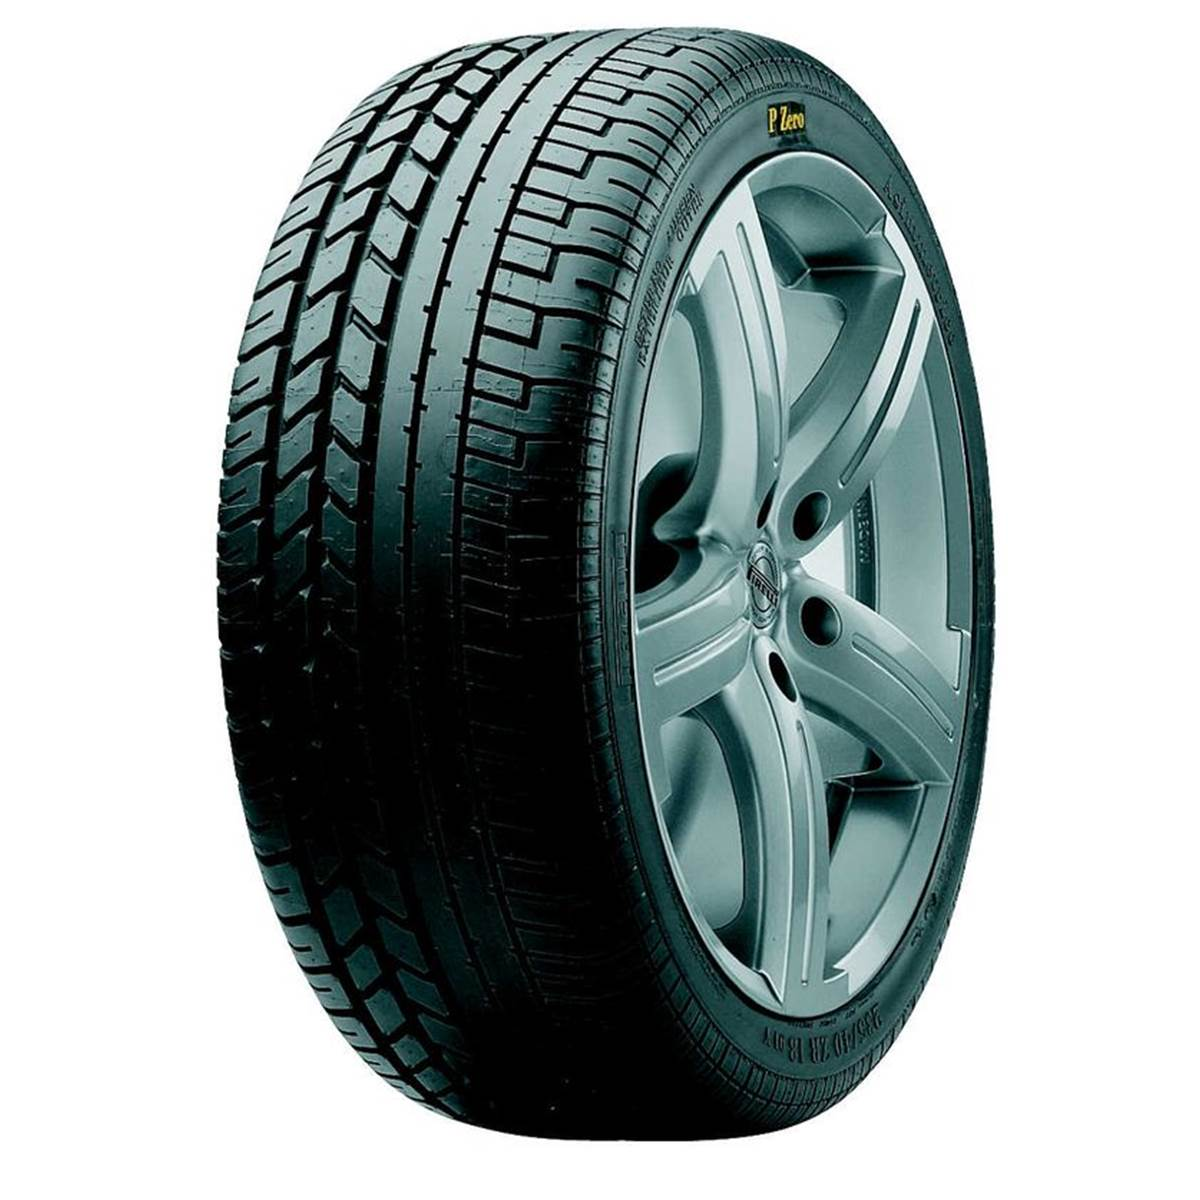 Pneu Pirelli 345/35R15 95Y Pzero Rosso Asimmetrico